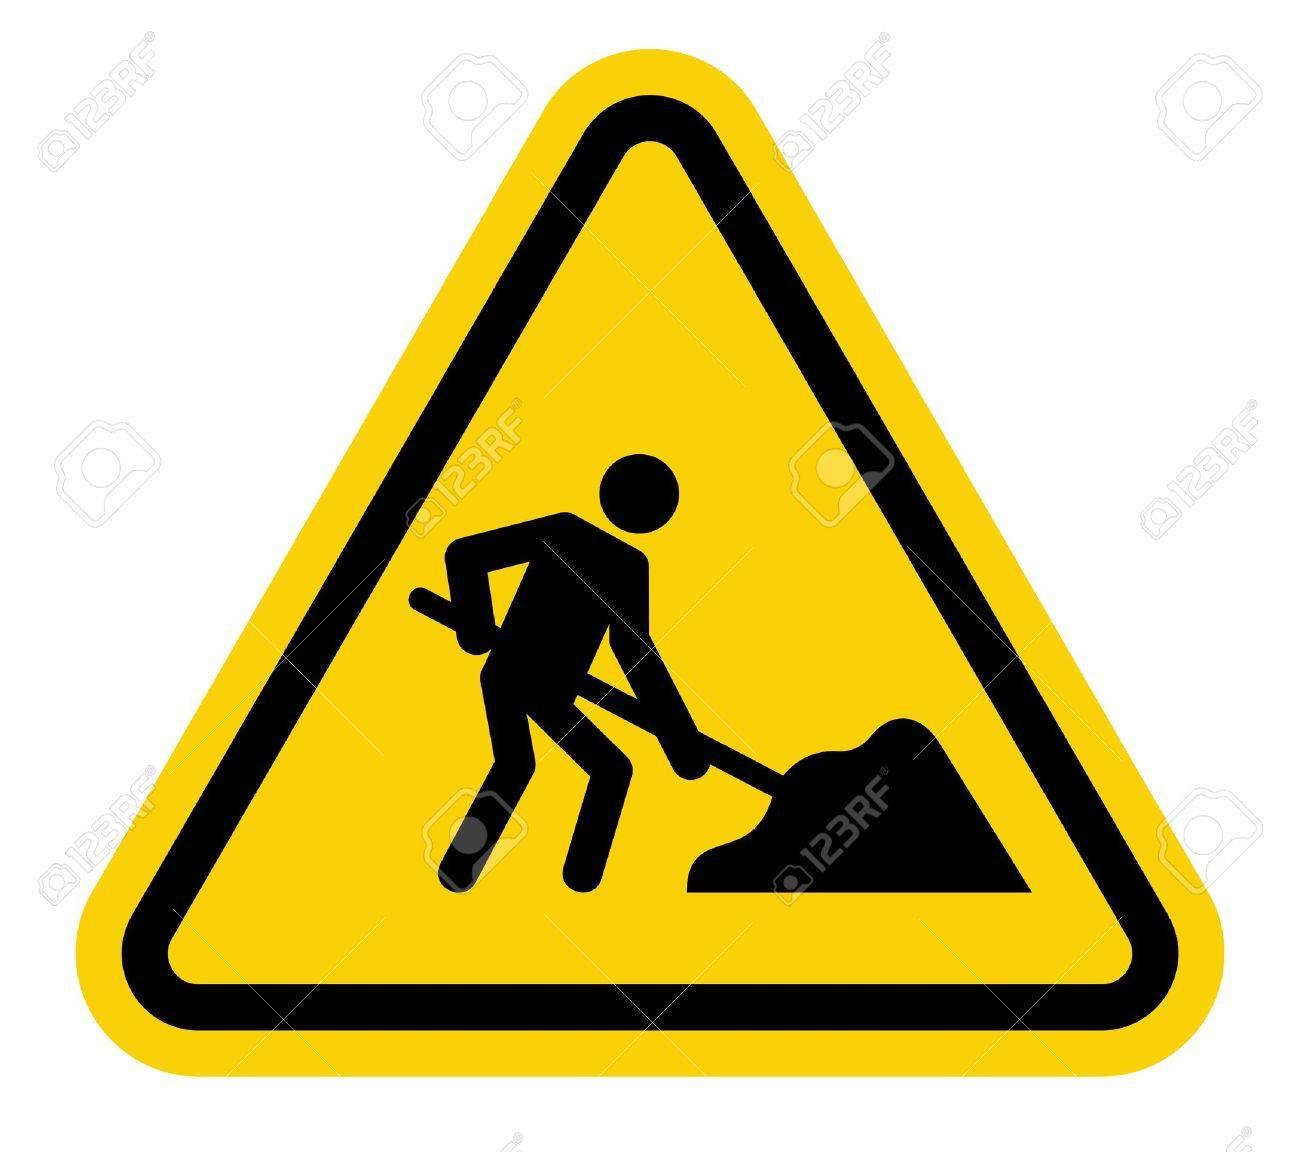 1300x1152 Under Construction Road Sign Royalty Free Cliparts, Vectors,